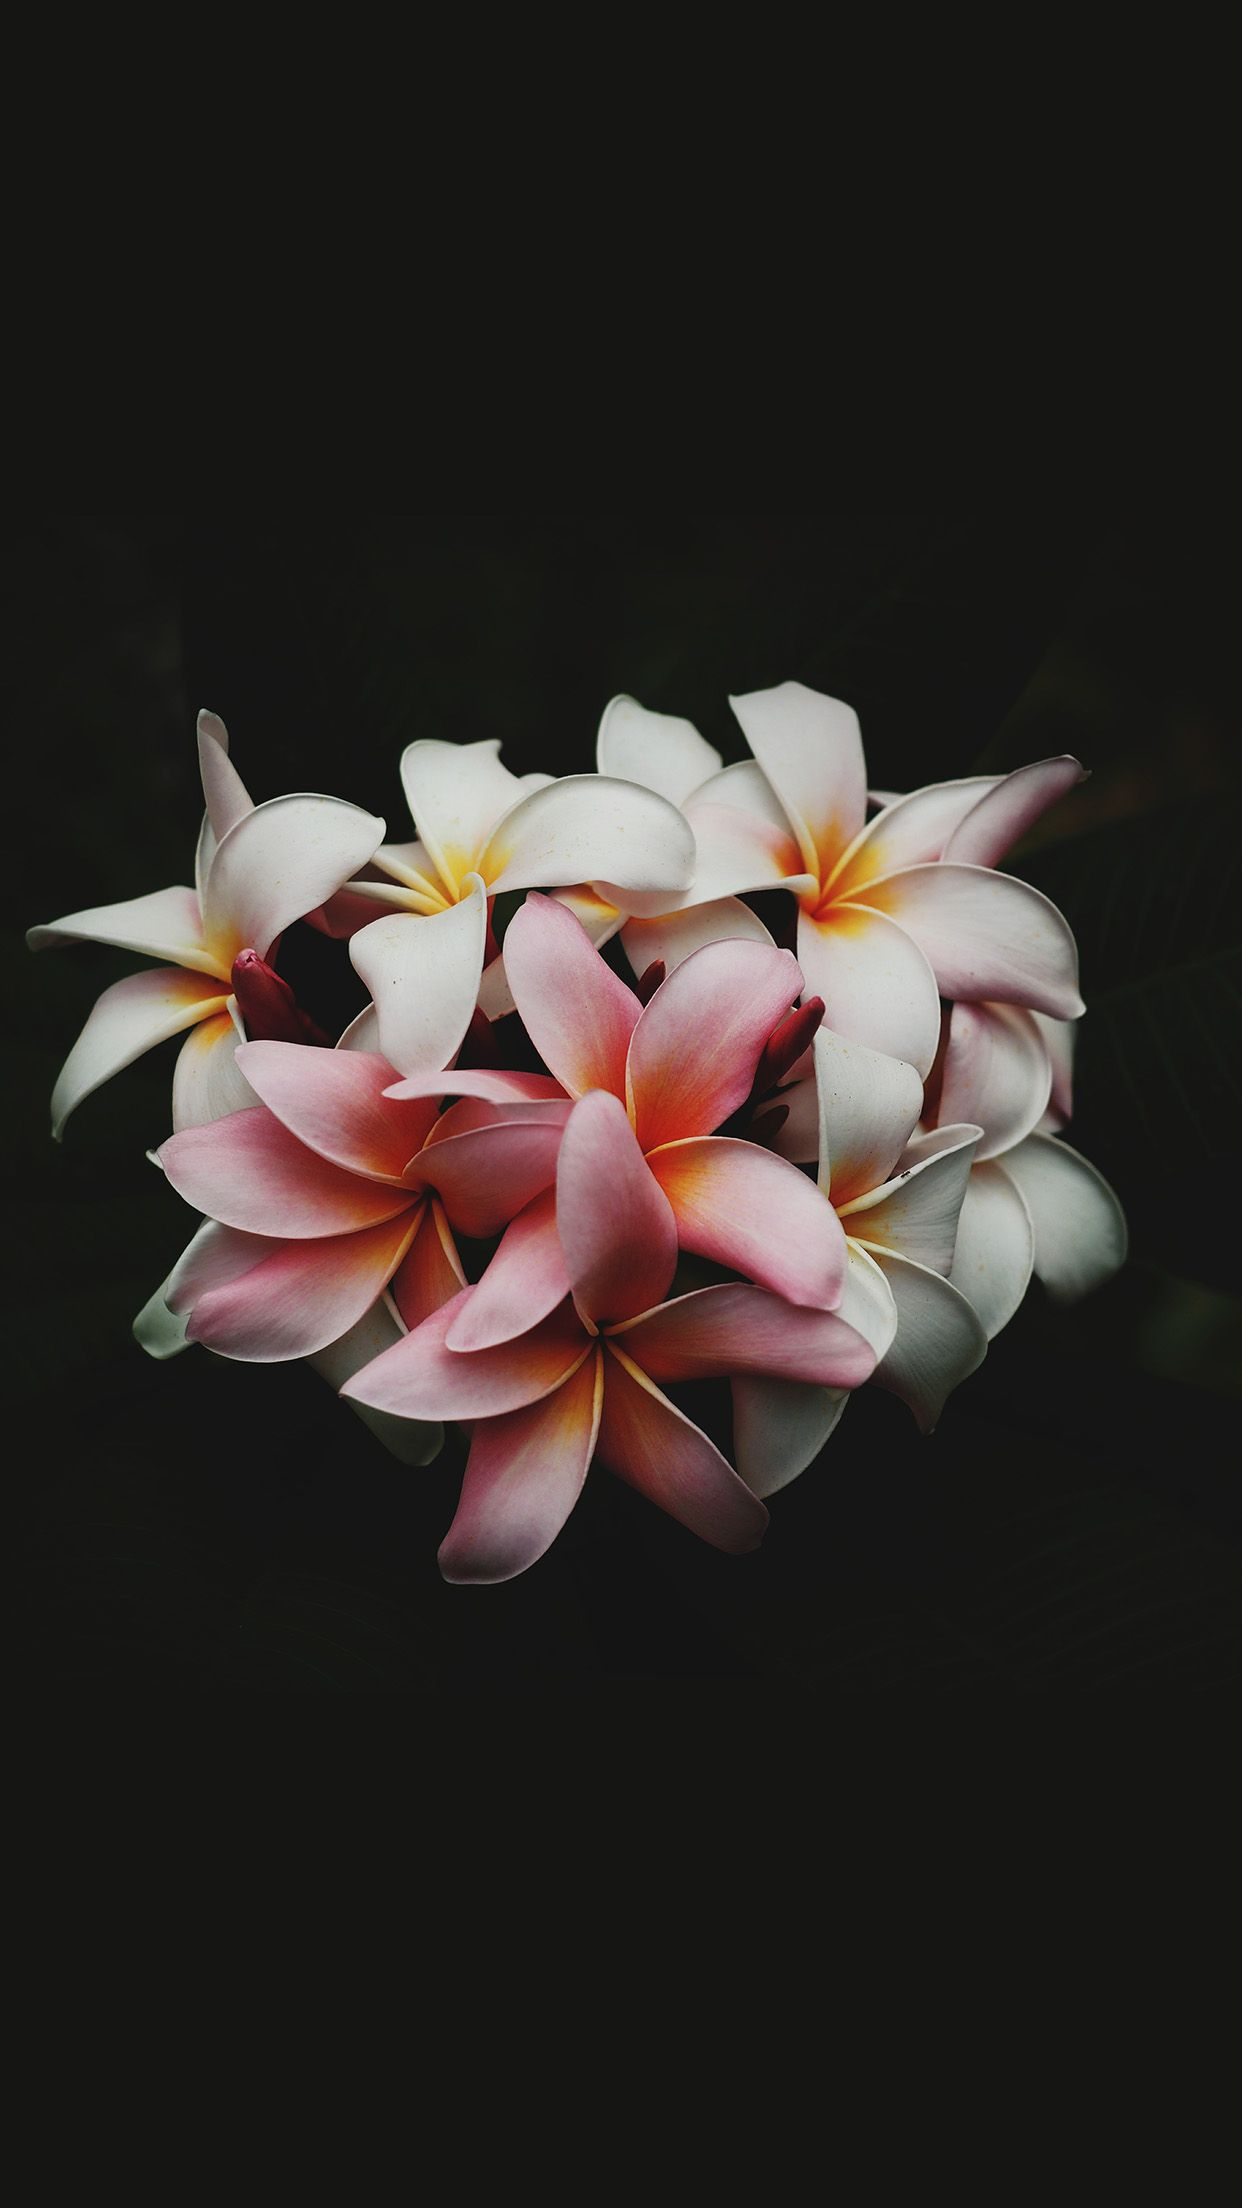 Dark Floral Iphone Wallpaper Floral Wallpaper Desktop Iphone